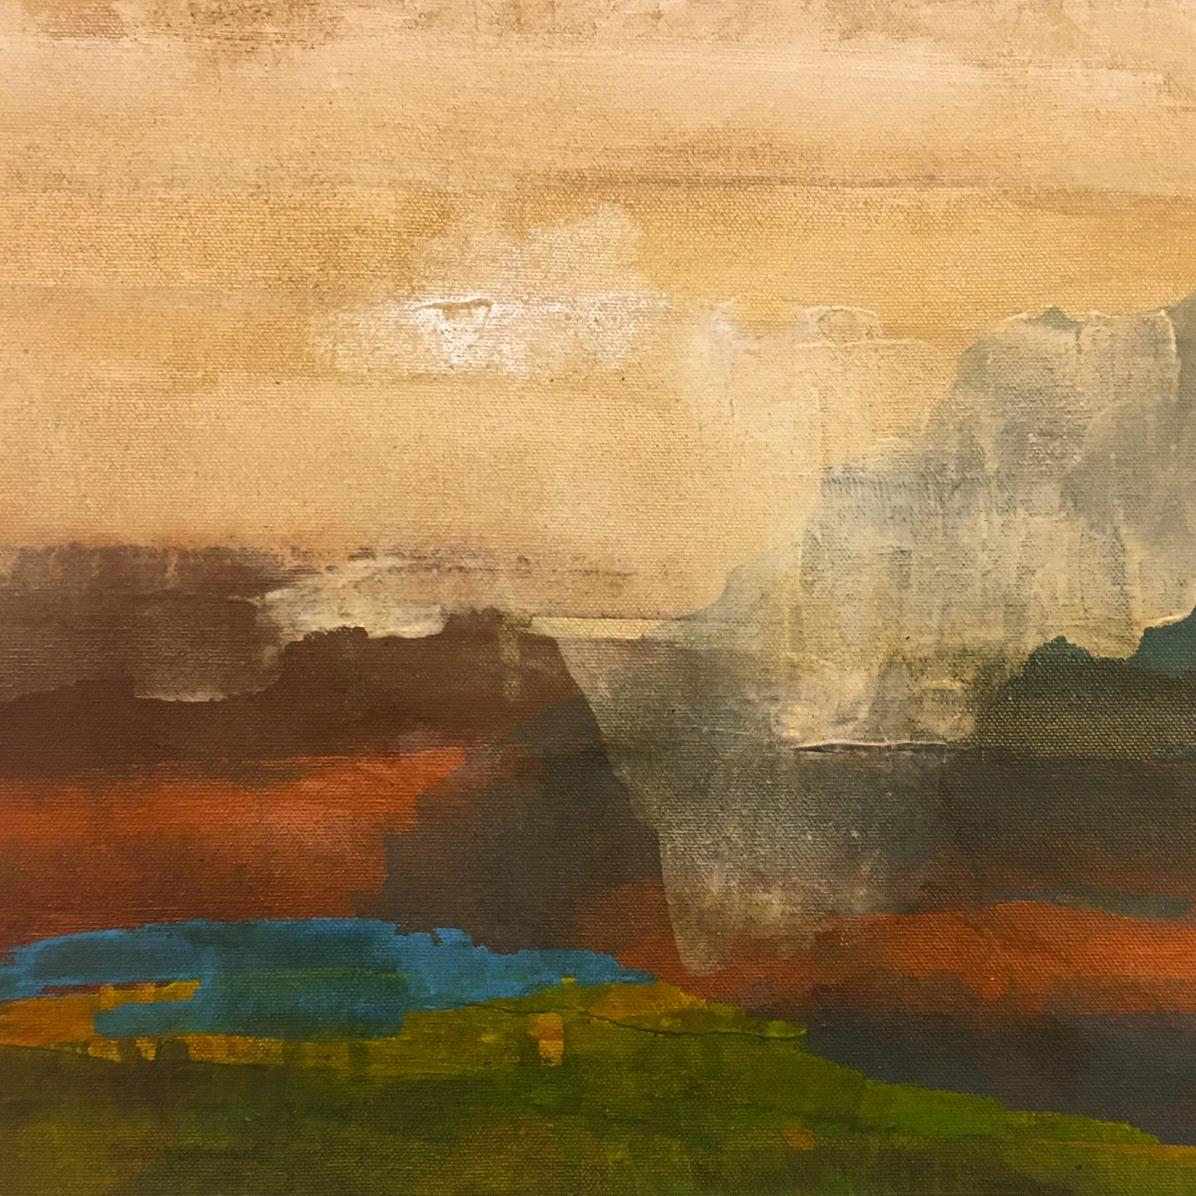 everithing sleep, 40x30 cm, acrylic on canvas, SOLD